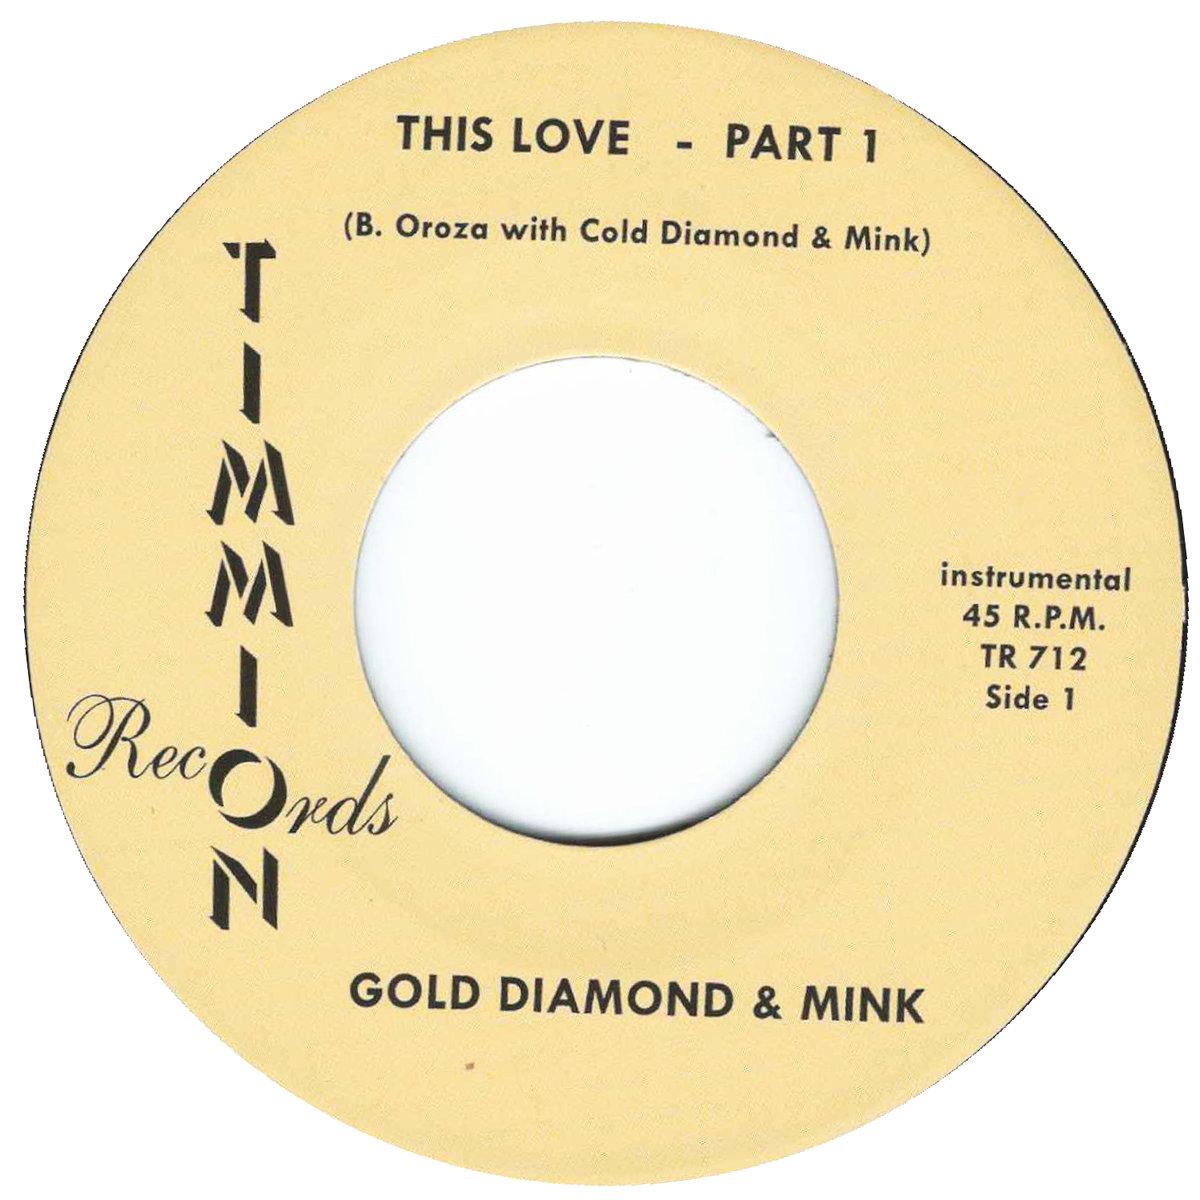 Cold Diamond & Mink